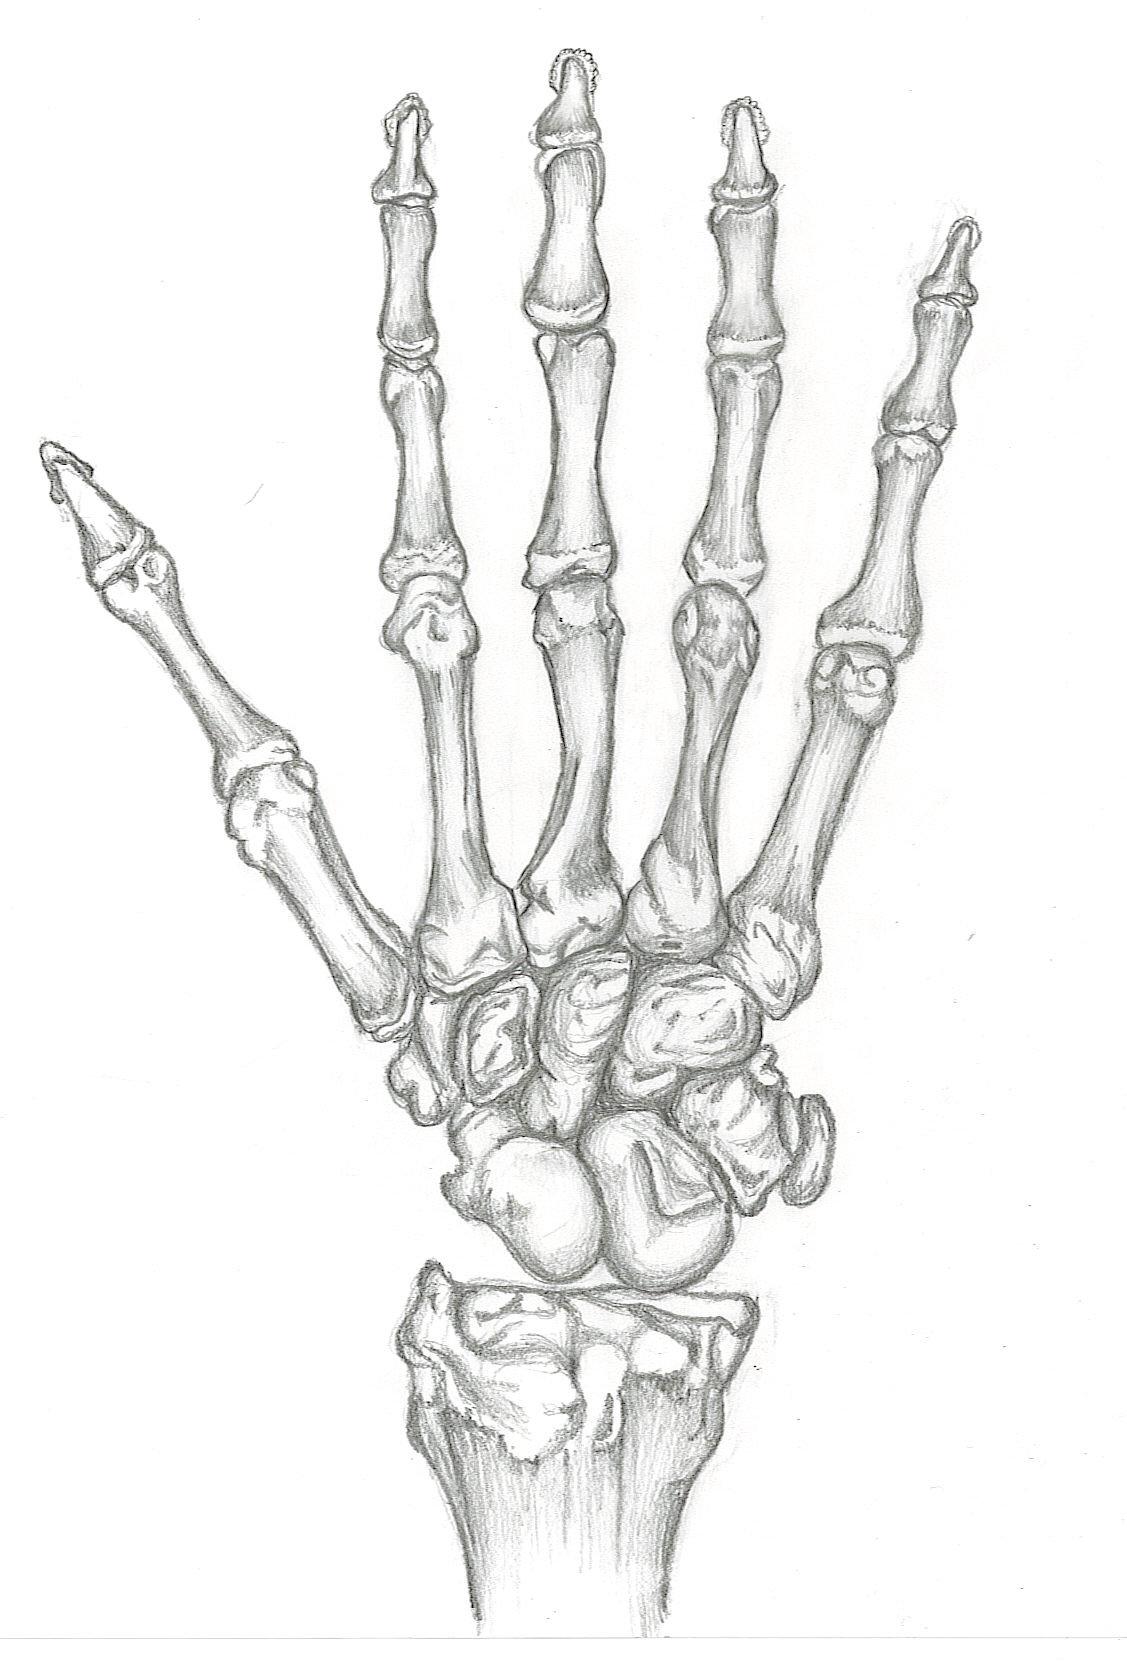 1127x1670 Study Of Skeleton Hand By Skeletonofarose